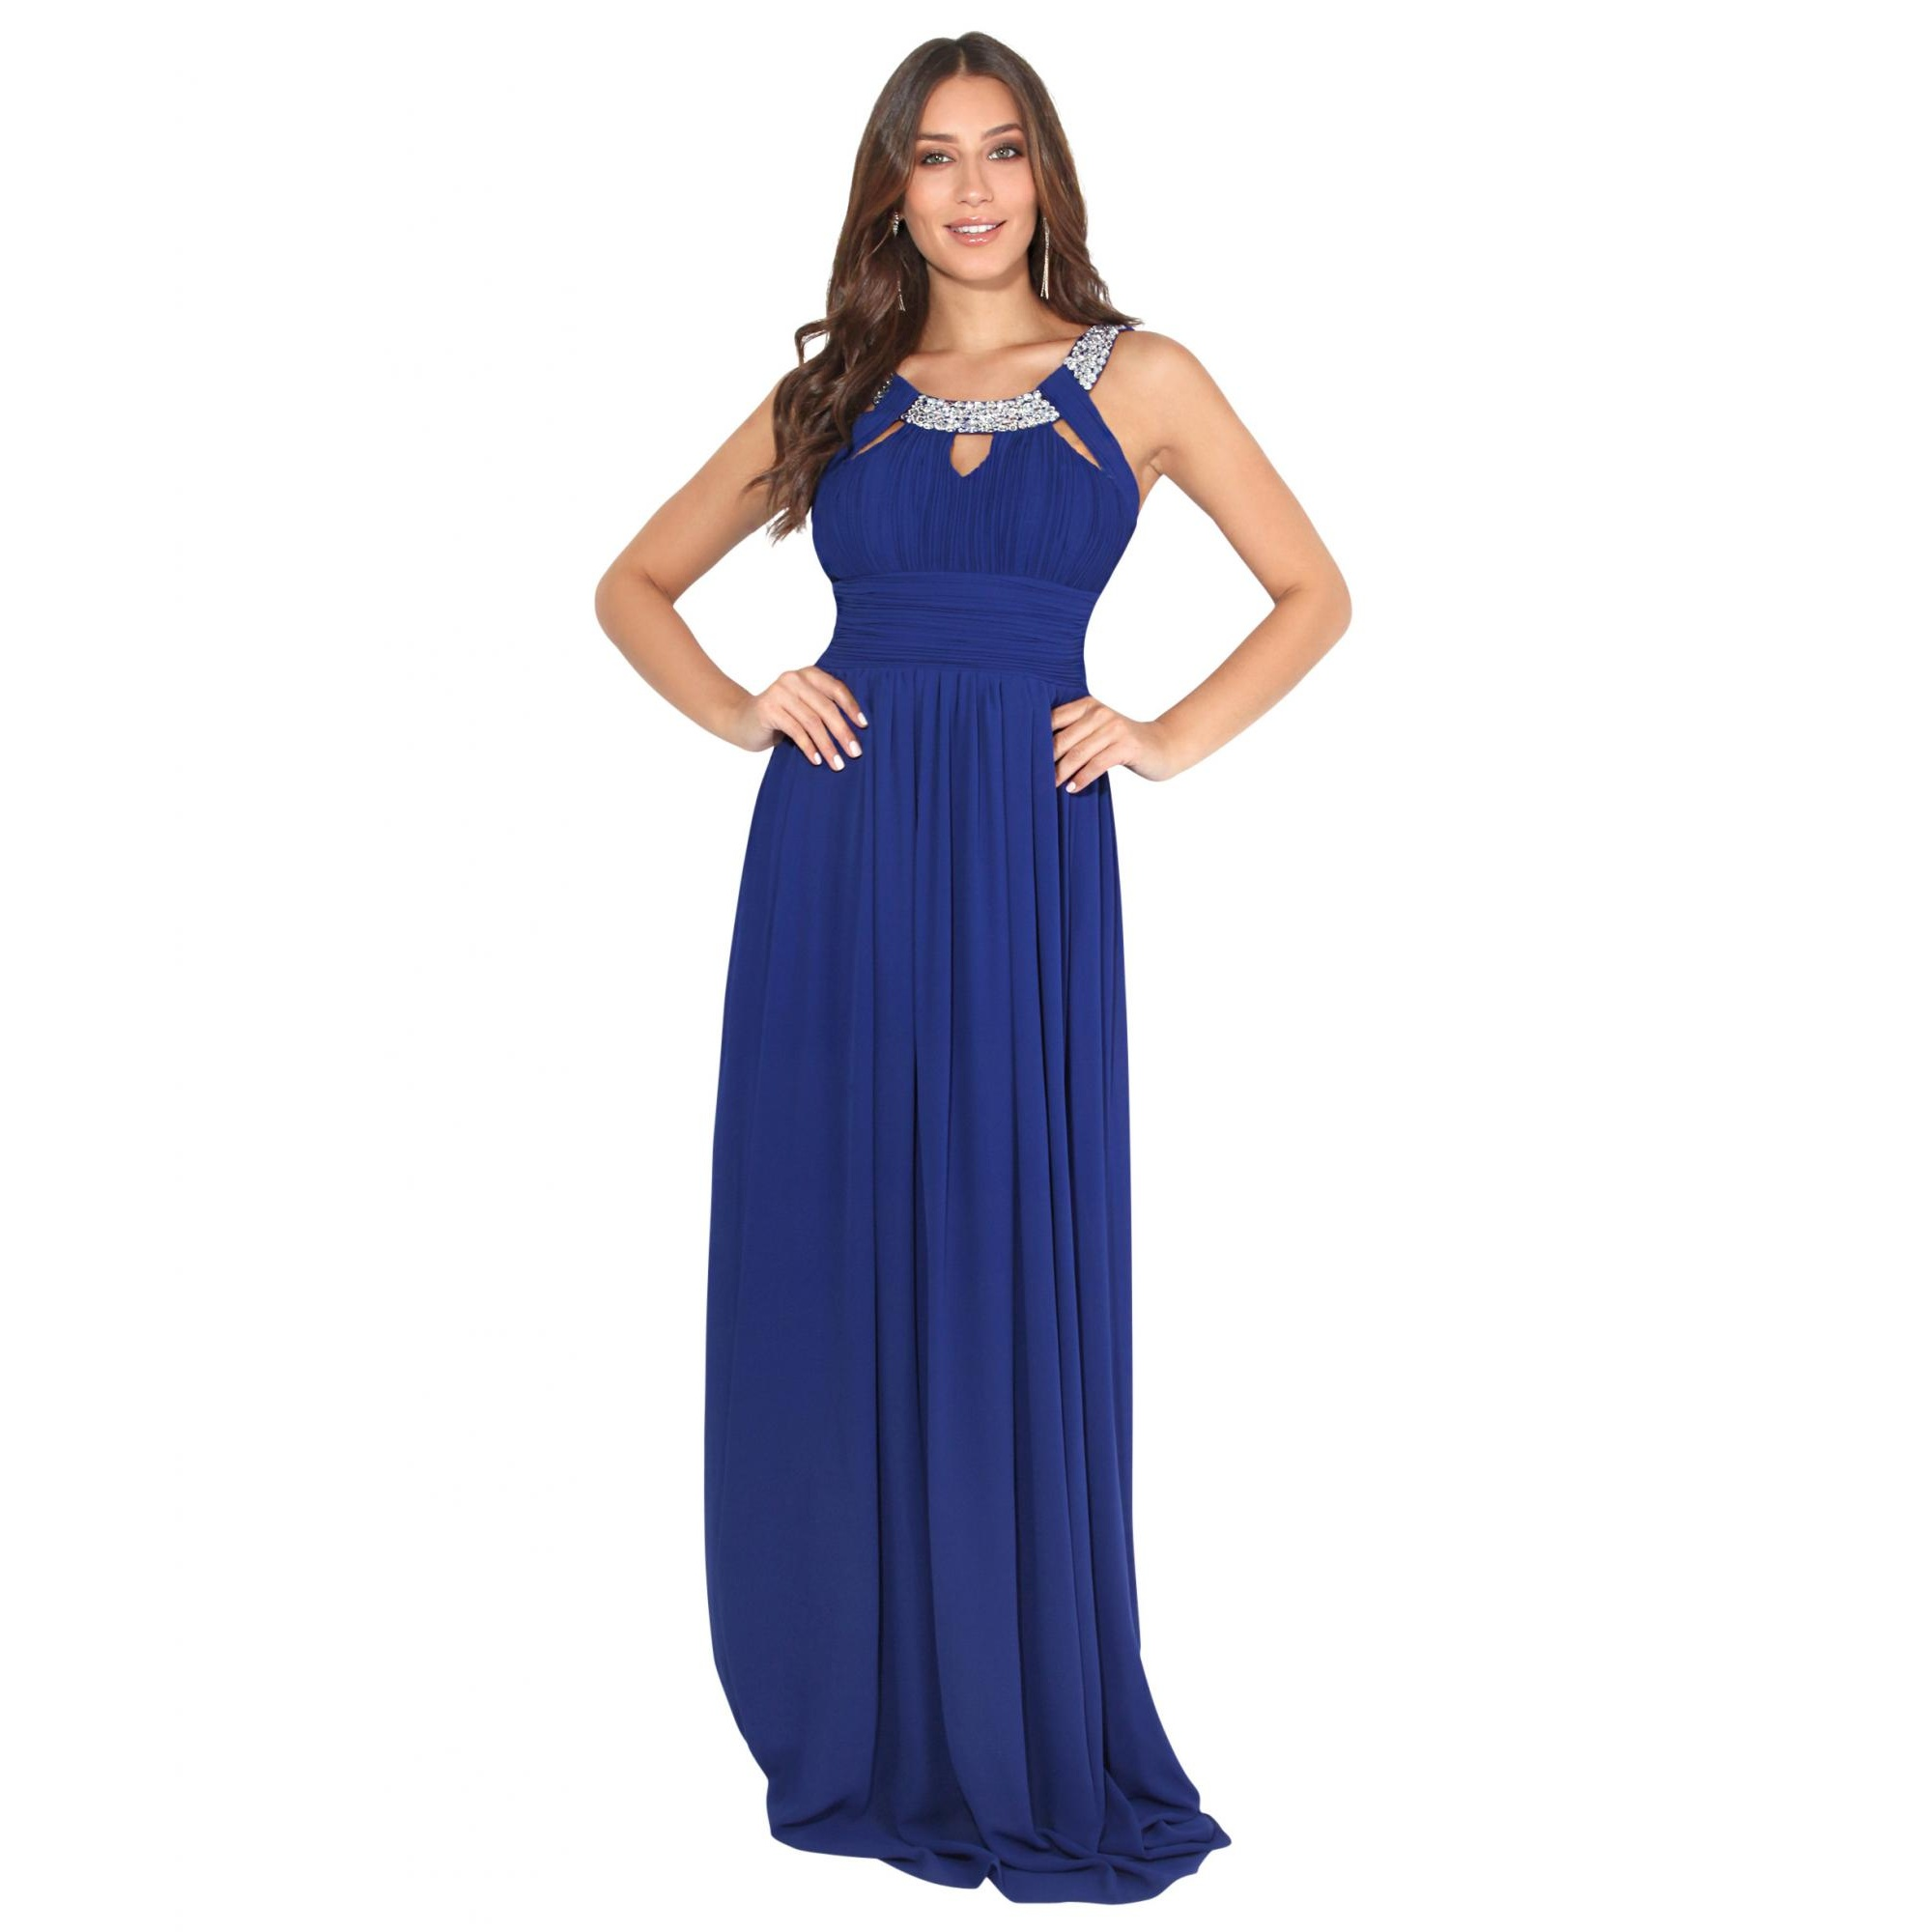 Krisp Womens/Ladies Diamante Neck Chiffon Maxi Dress (14 UK) (Royal Blue)